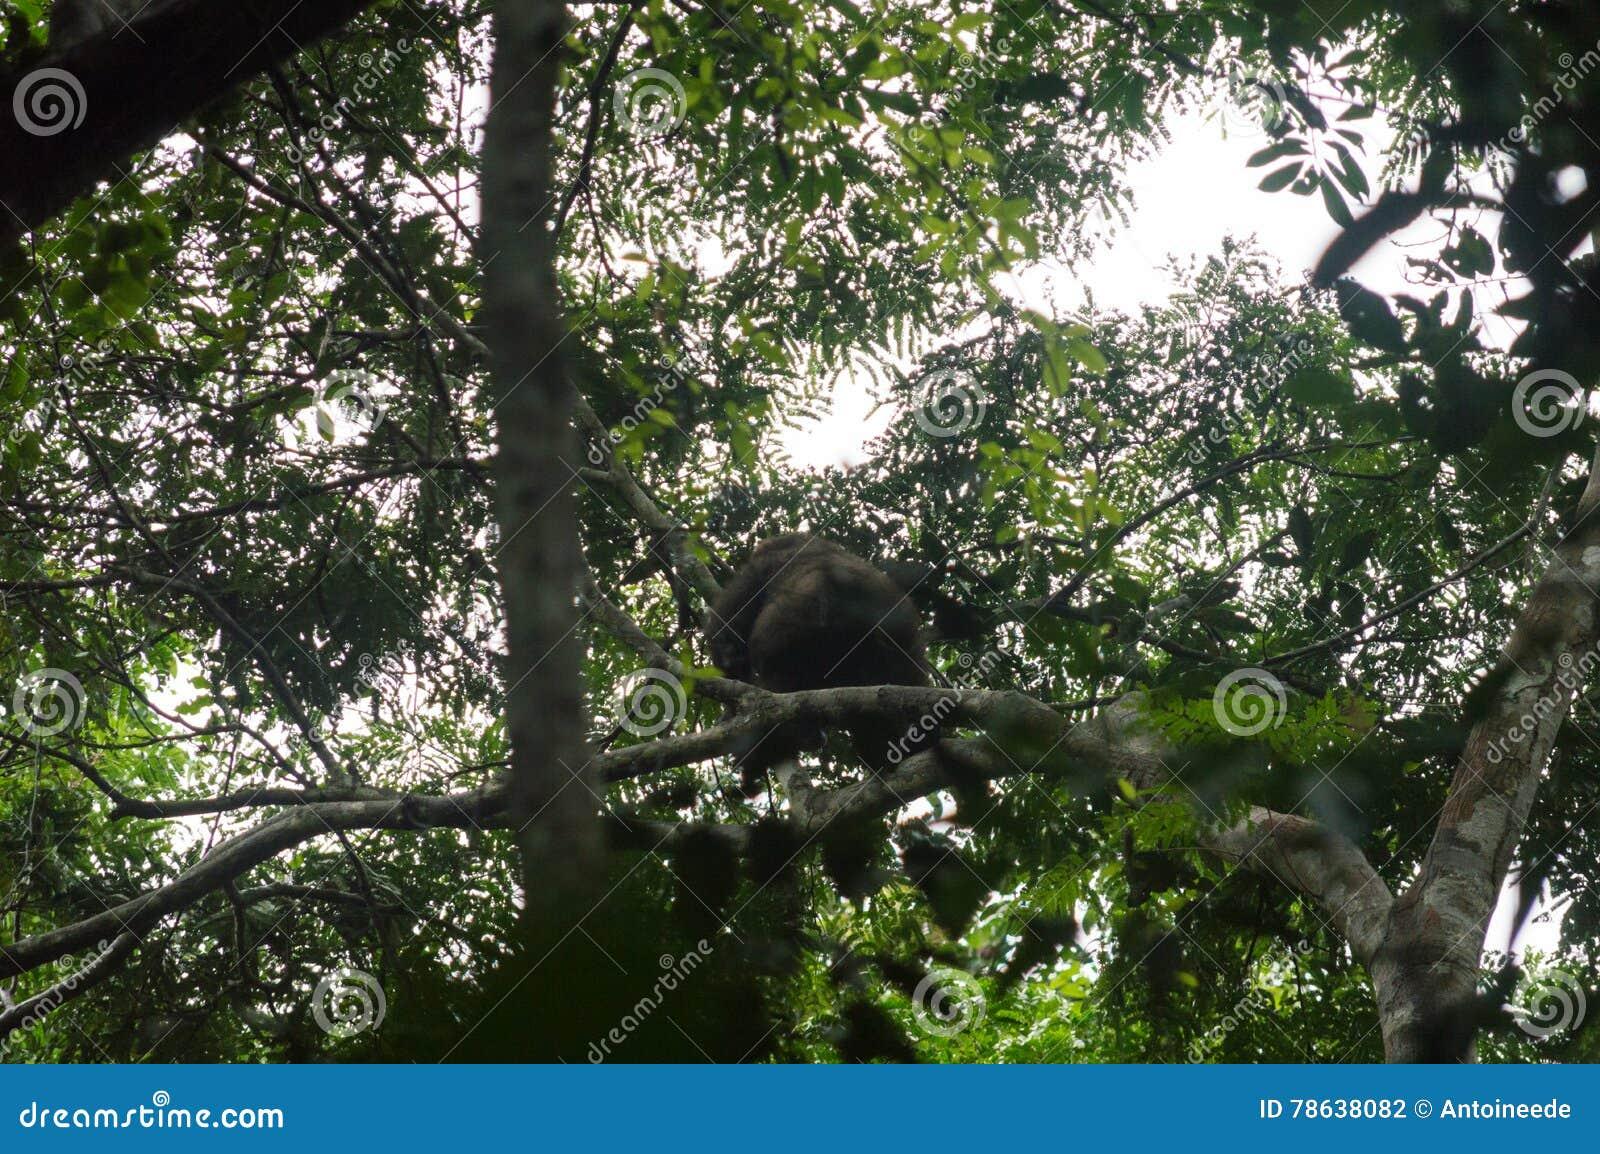 Western lowland gorilla on a tree, western african rainforest, Conkouati-Douli national park, Congo.